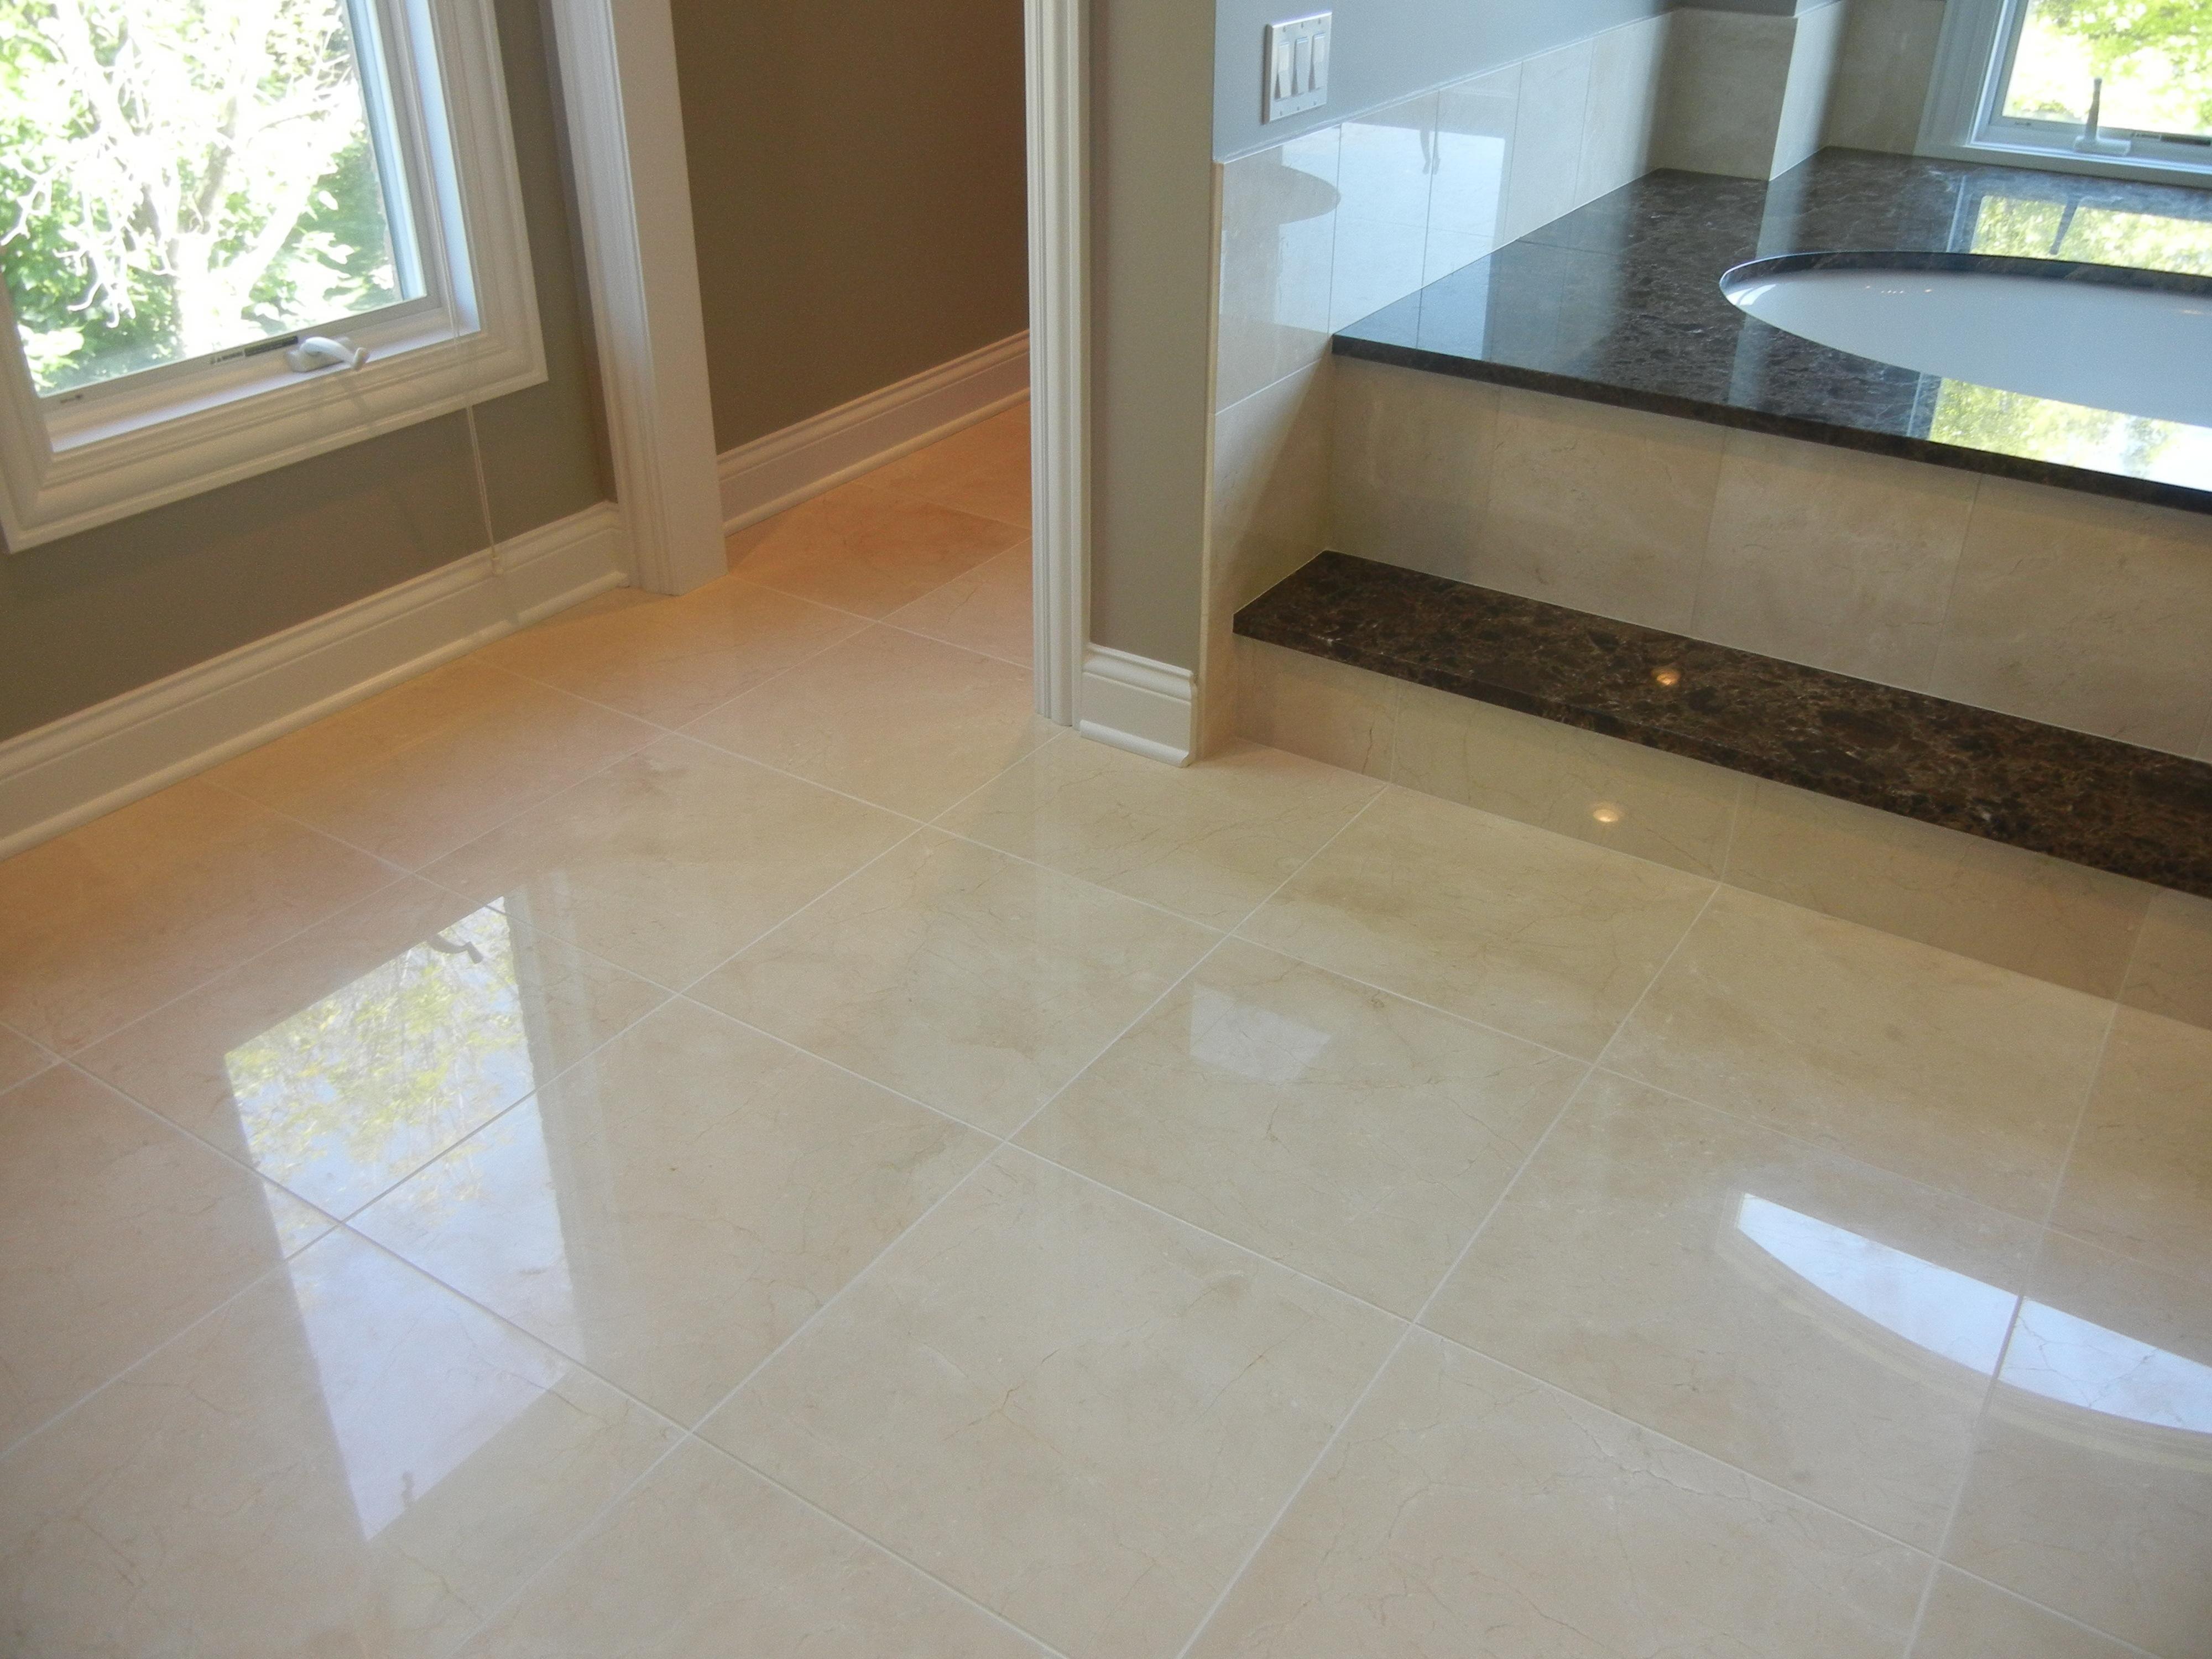 Pin By Levantina Usa On Bathroom Beauties Bathroom Redesign Redesign Flooring